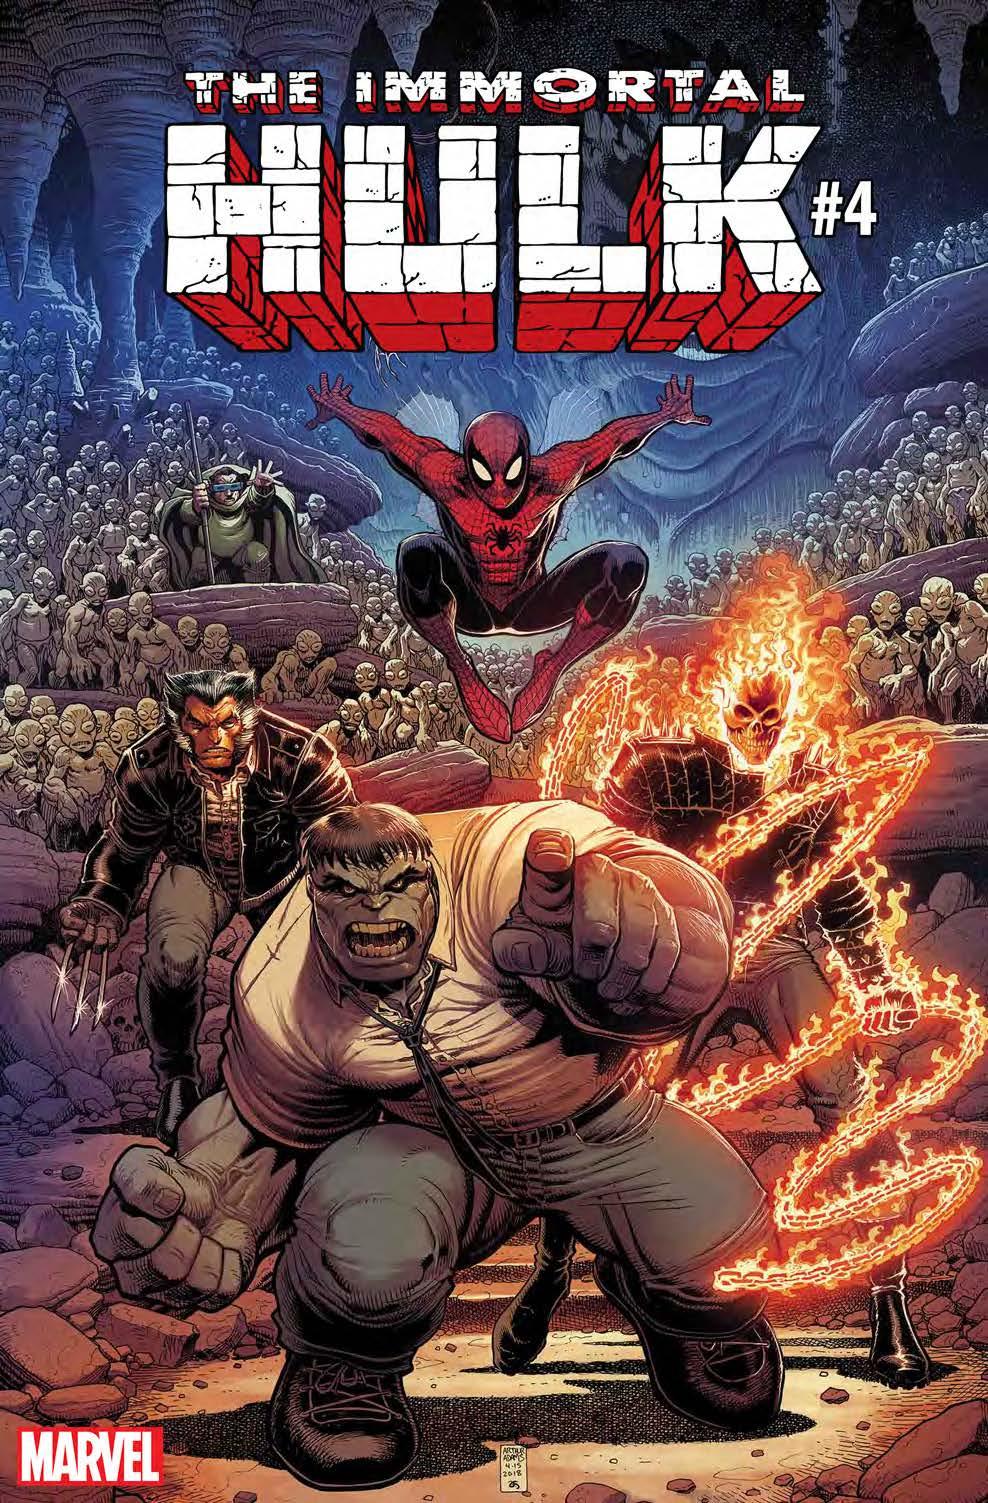 The Return Of The Fantastic Four marvel variant